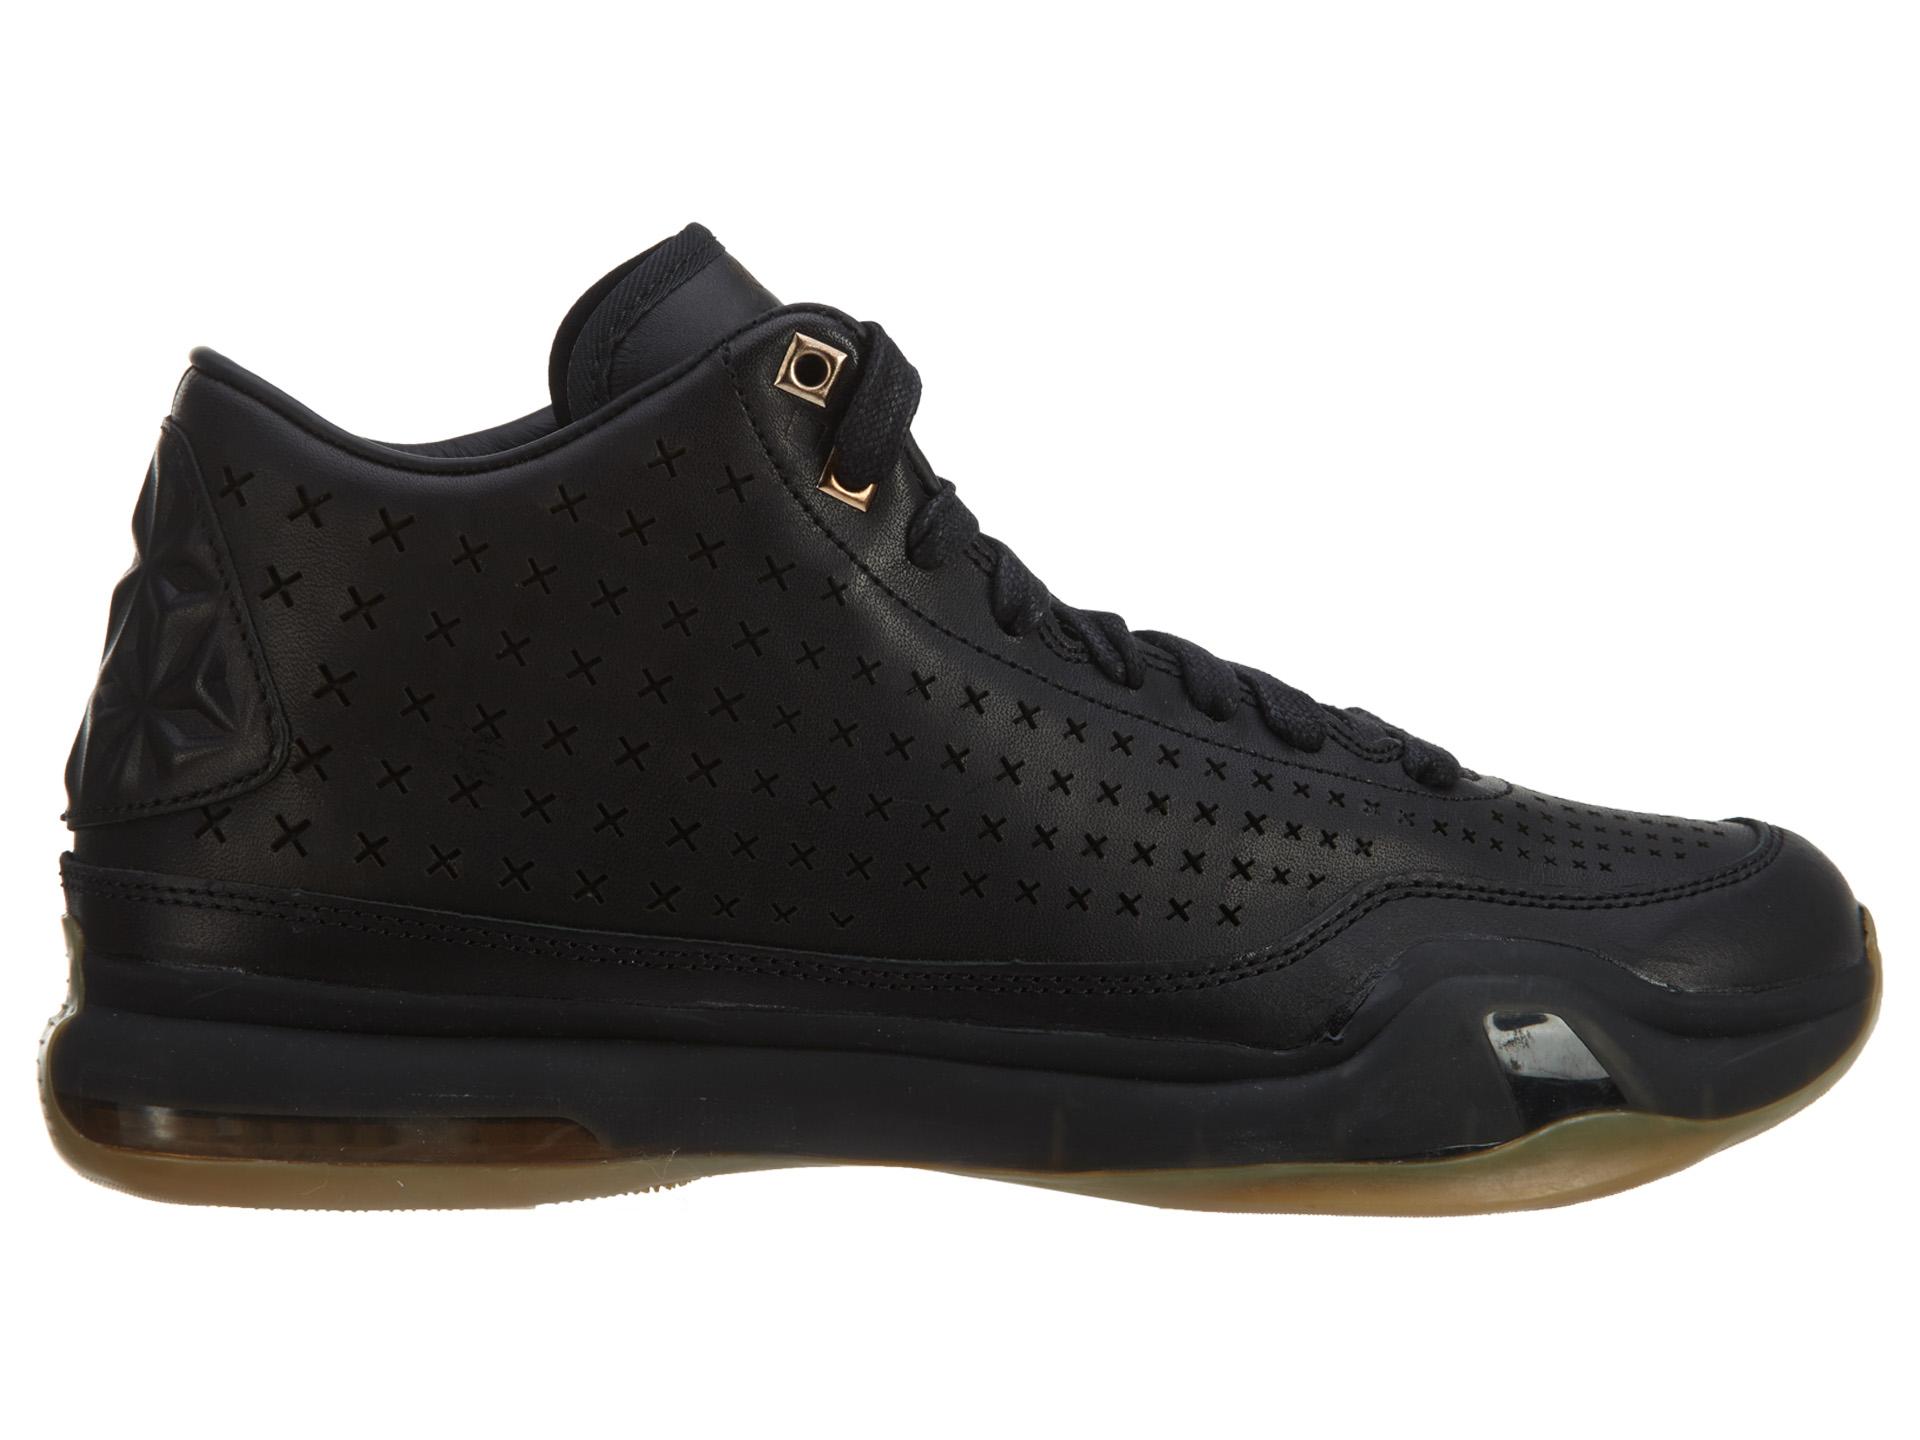 Nike Kobe 10 Mid EXT Black Metallic